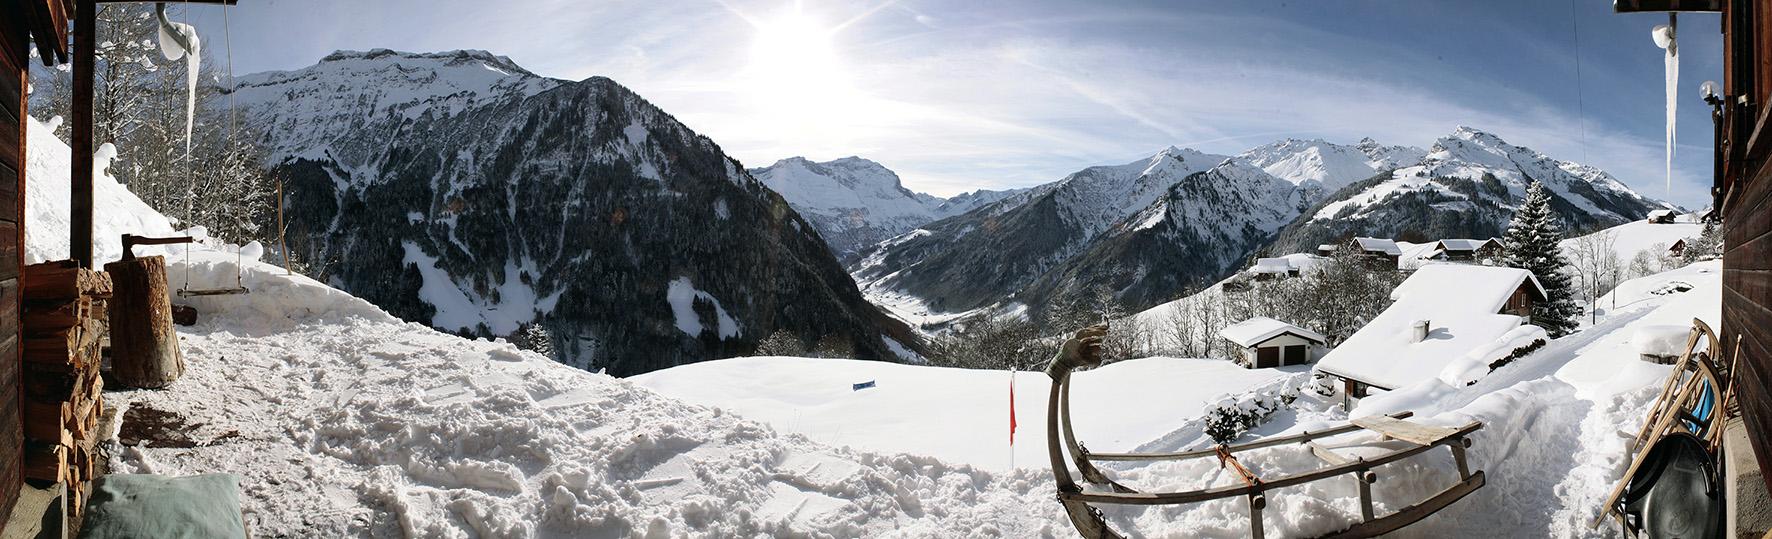 Weissenberge Winter Panorama